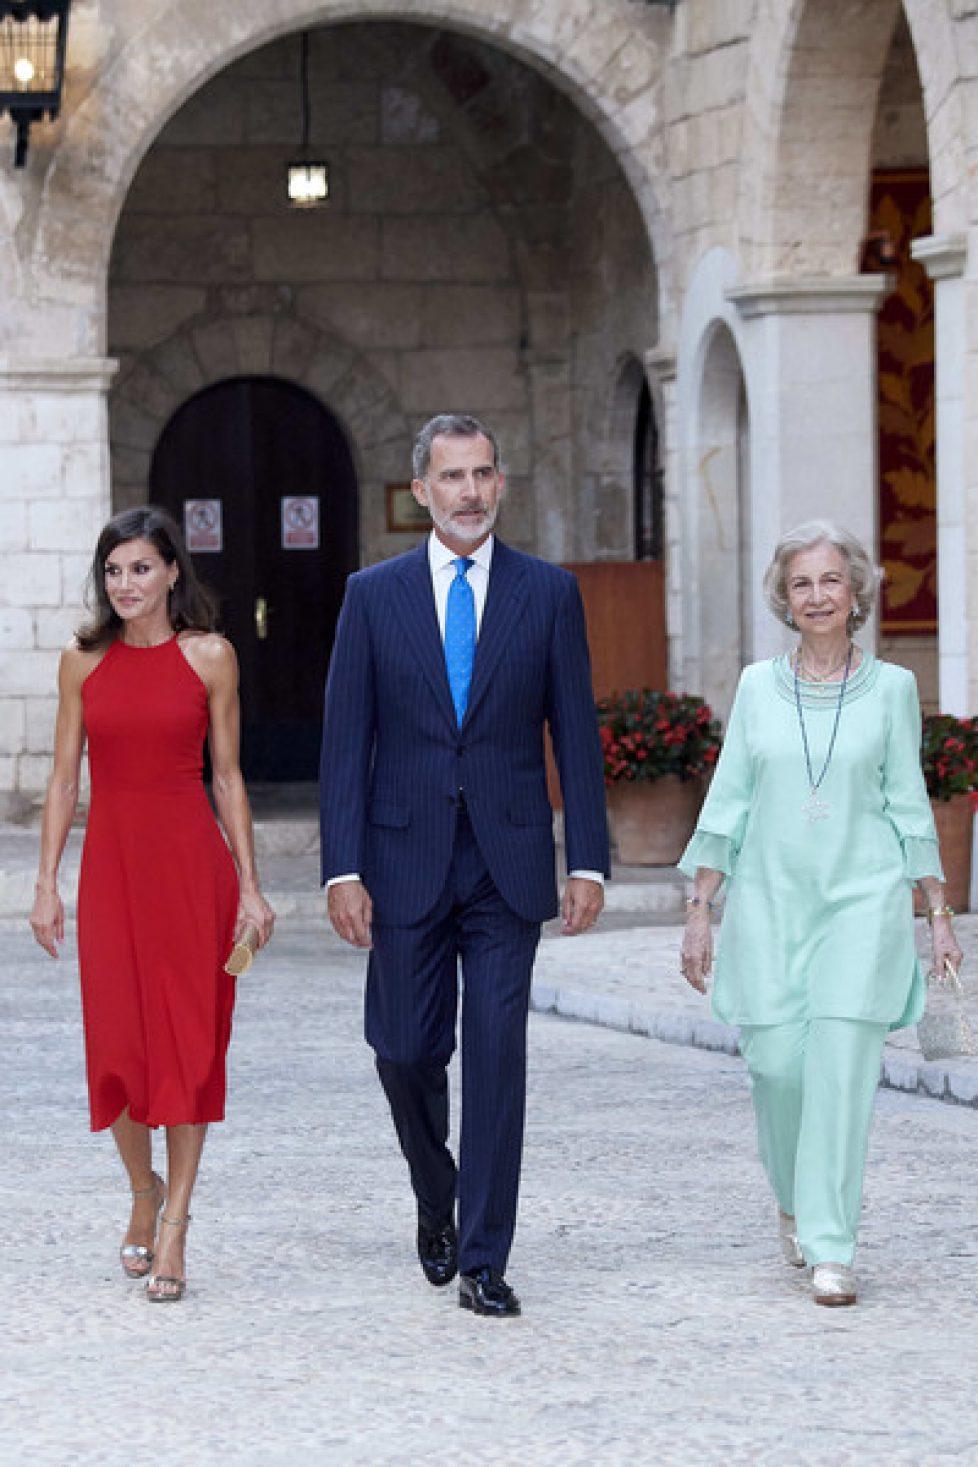 Spanish+Royals+Host+Dinner+Authorities+Palma+aIx6JPM8yFYl